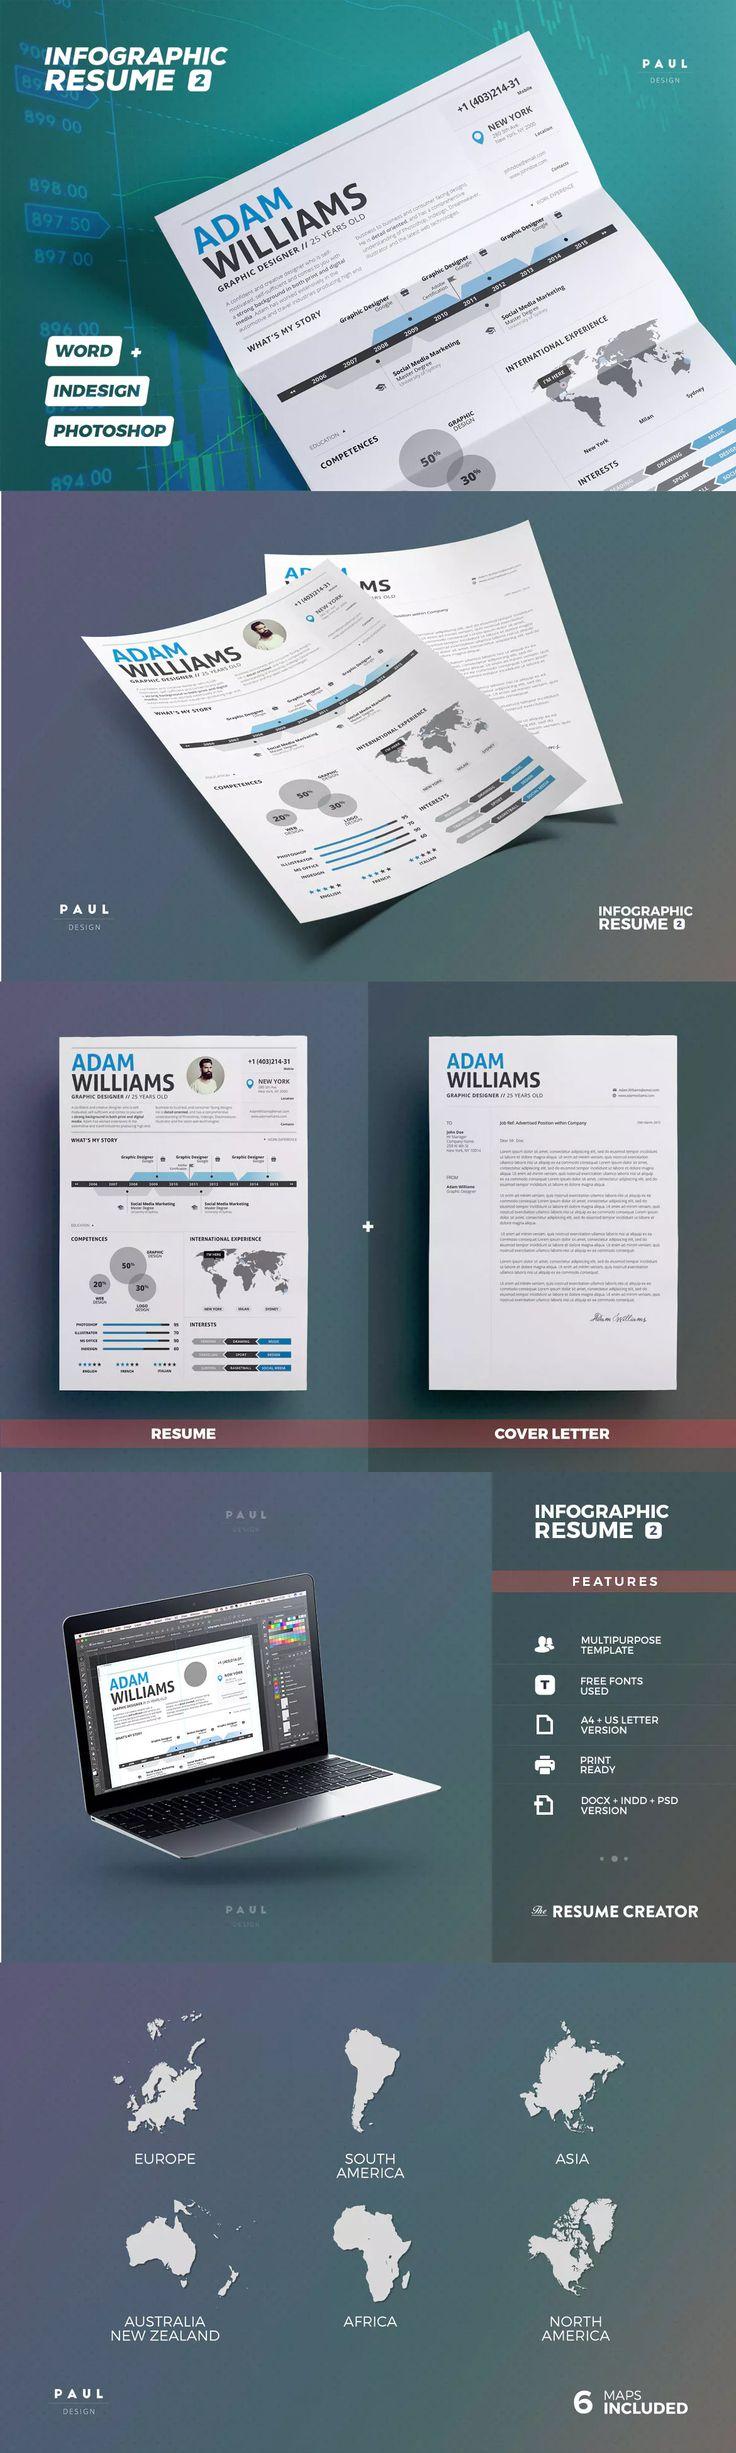 VisualInfographic Resume Examples  VizualResumecom